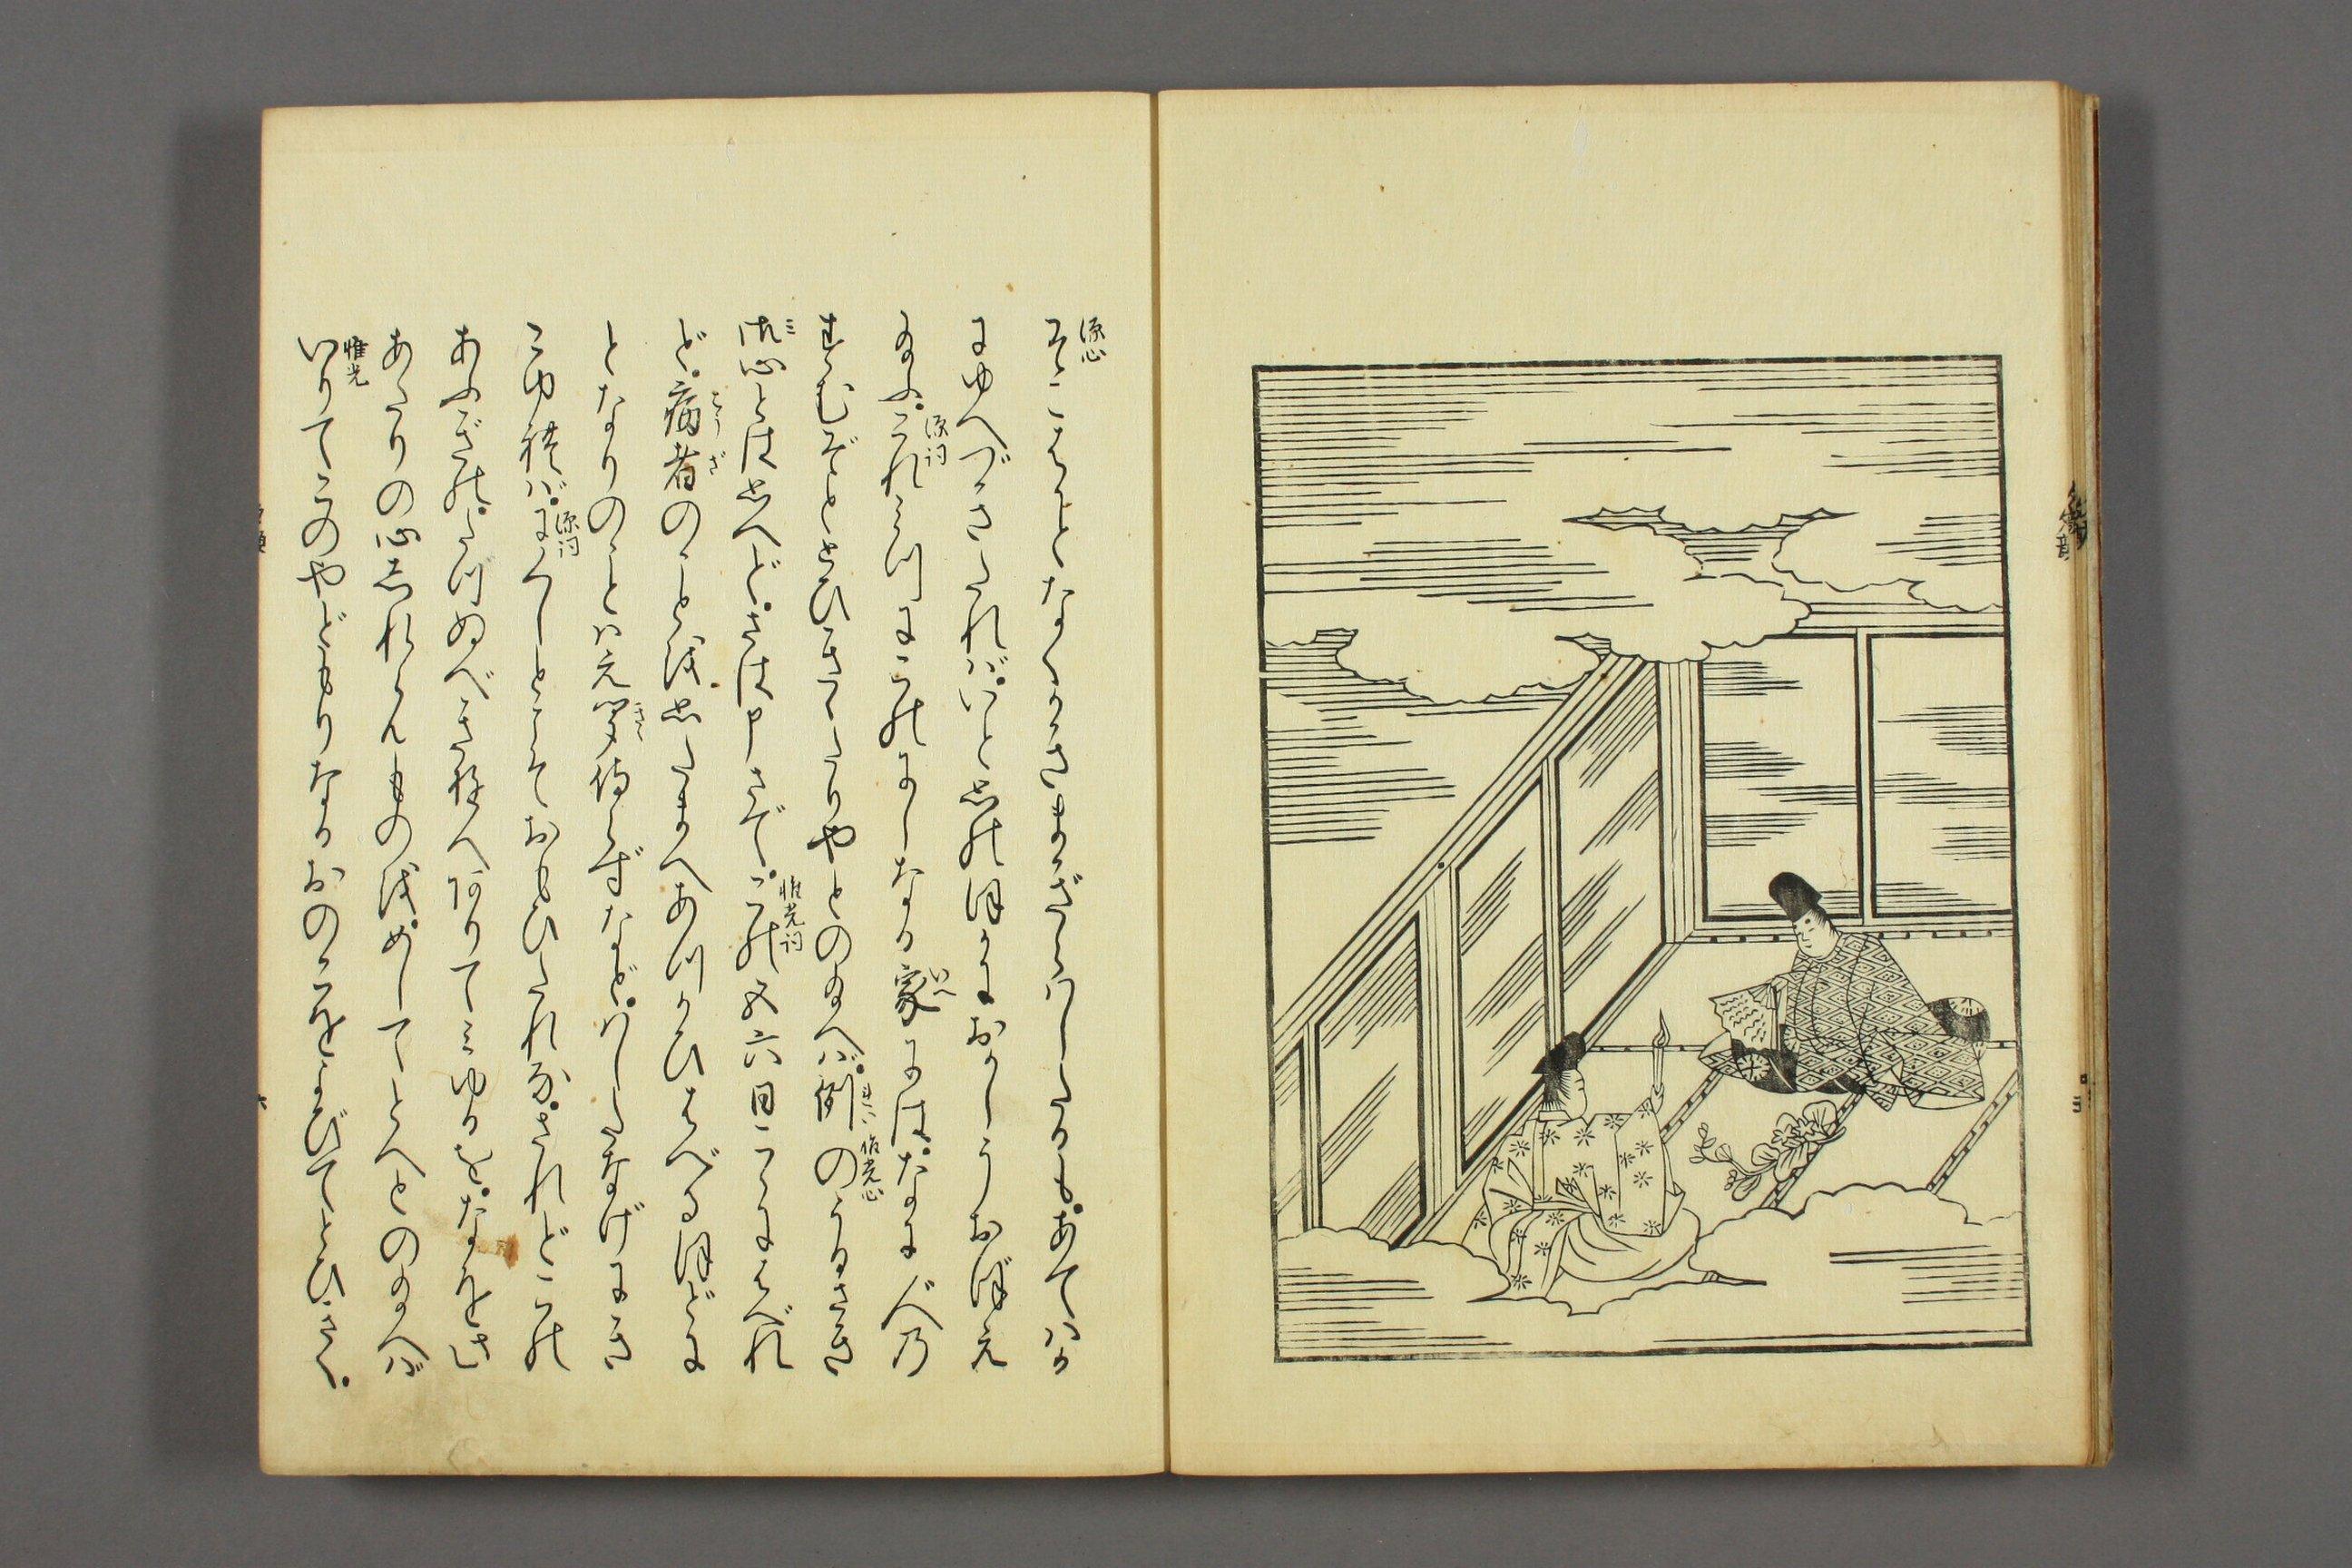 http://archive.wul.waseda.ac.jp/kosho/bunko30/bunko30_a0007/bunko30_a0007_0004/bunko30_a0007_0004_p0007.jpg